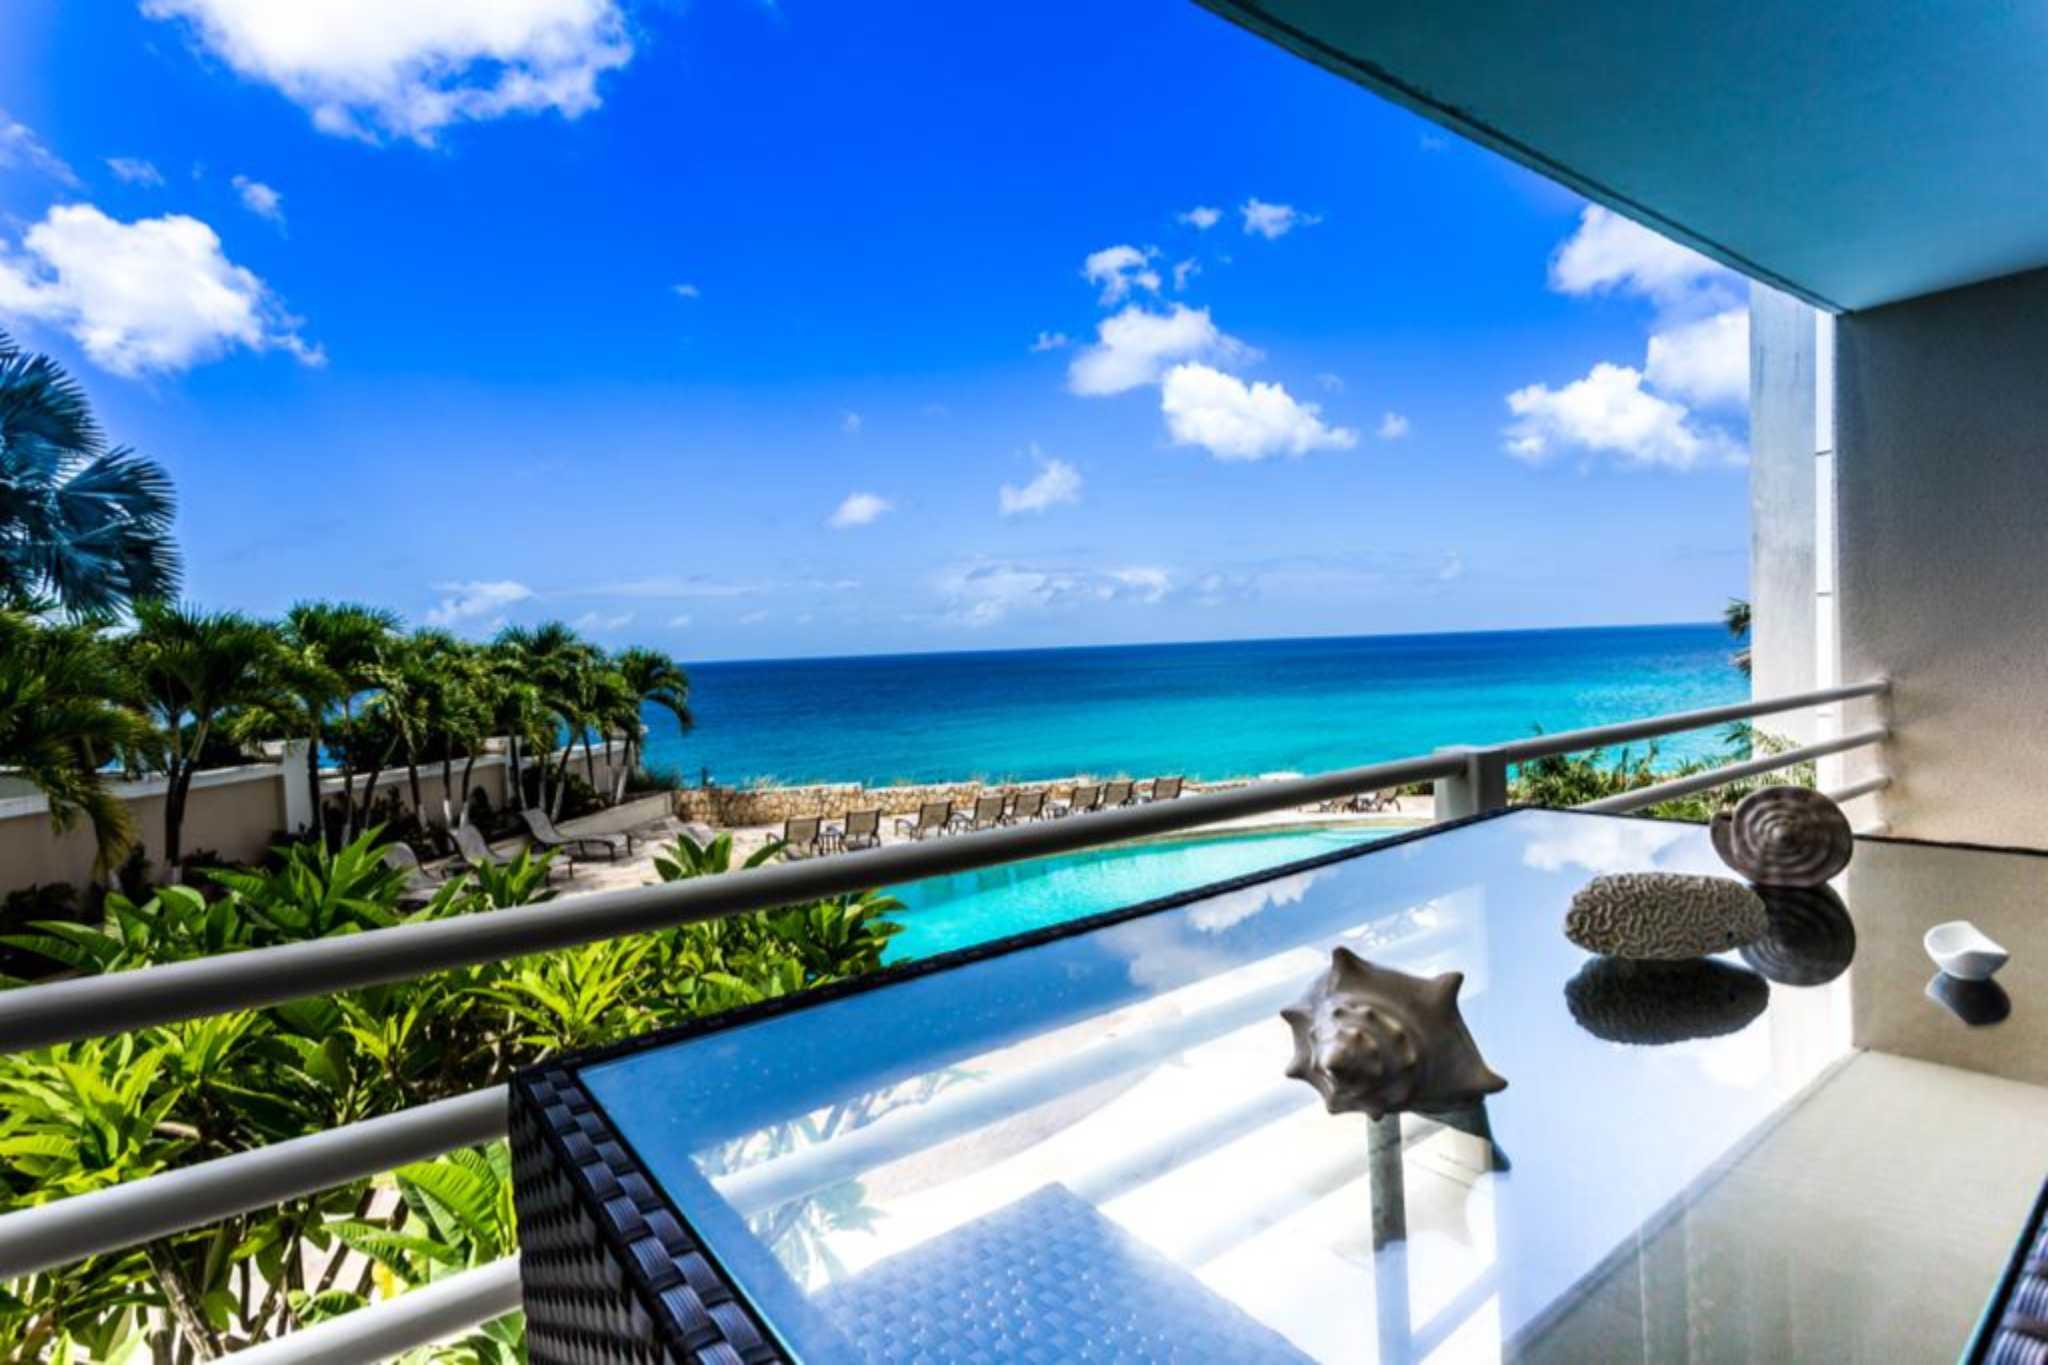 Rainbow Beach Club Two Bedroom Oceanview Condo For Rent